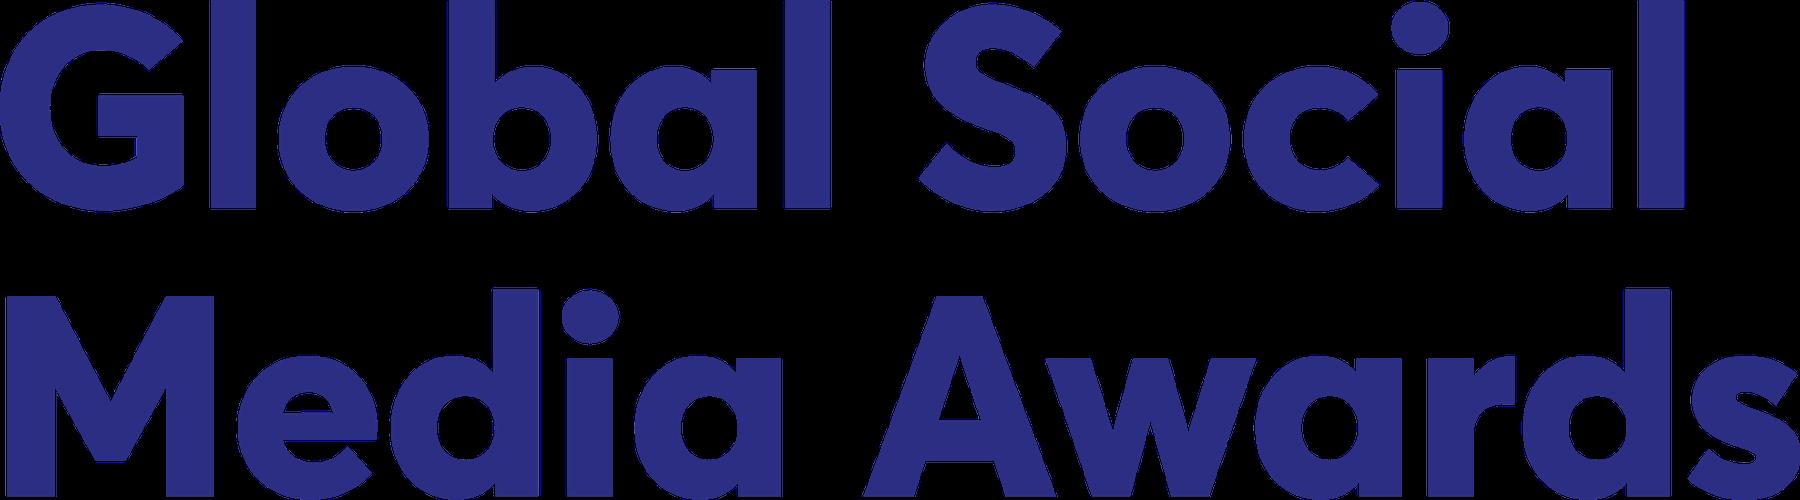 Global Social Media Awards logo